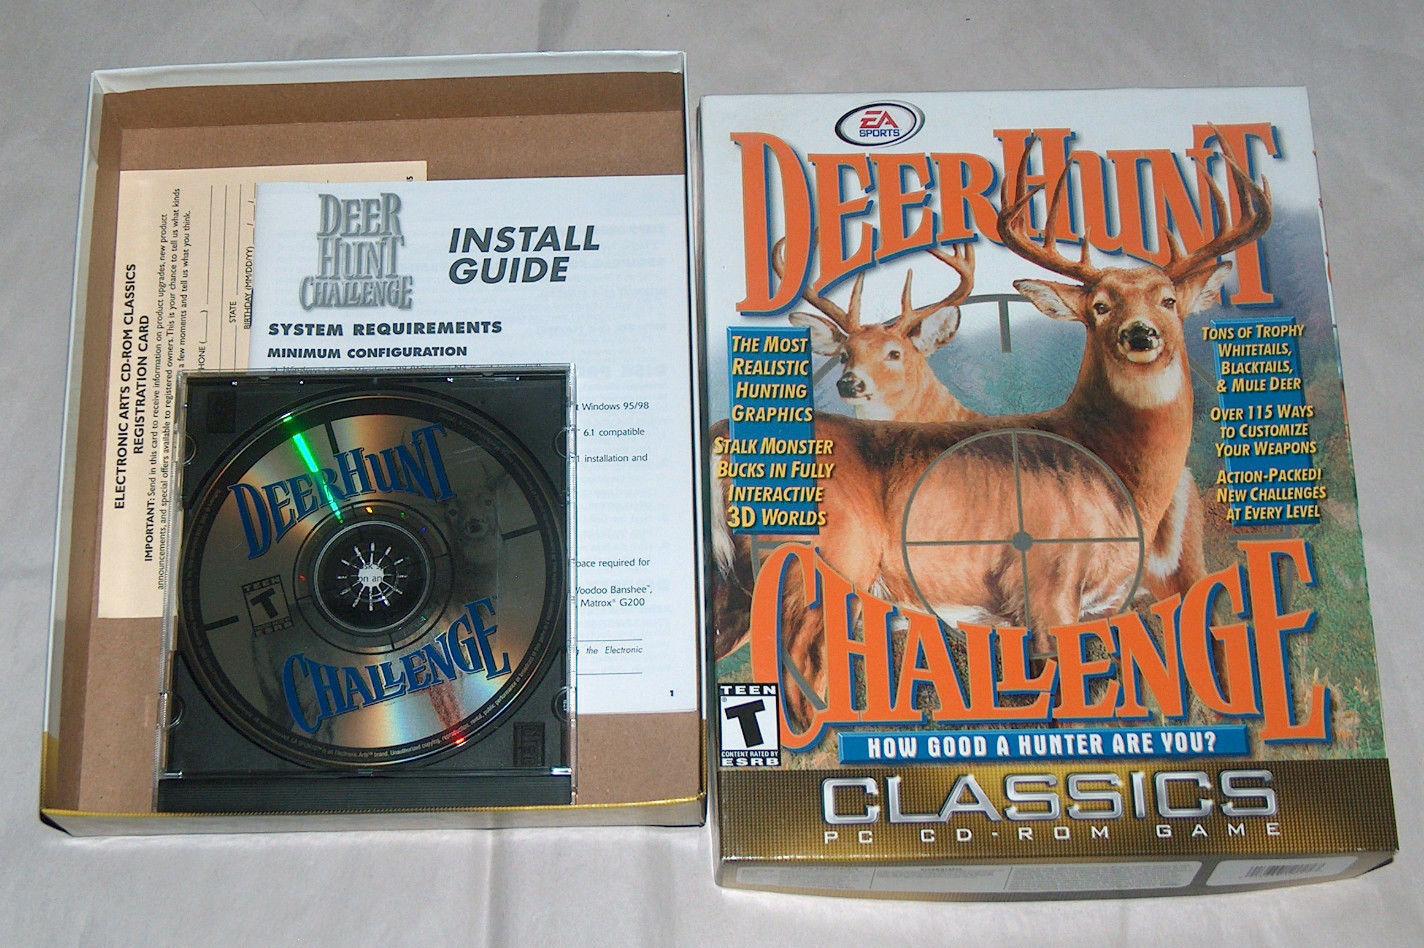 RARE EA Sports Deer Hunt Challenge 3D Video Game PC CD-ROM w/ BOX, GUIDE, MANUAL